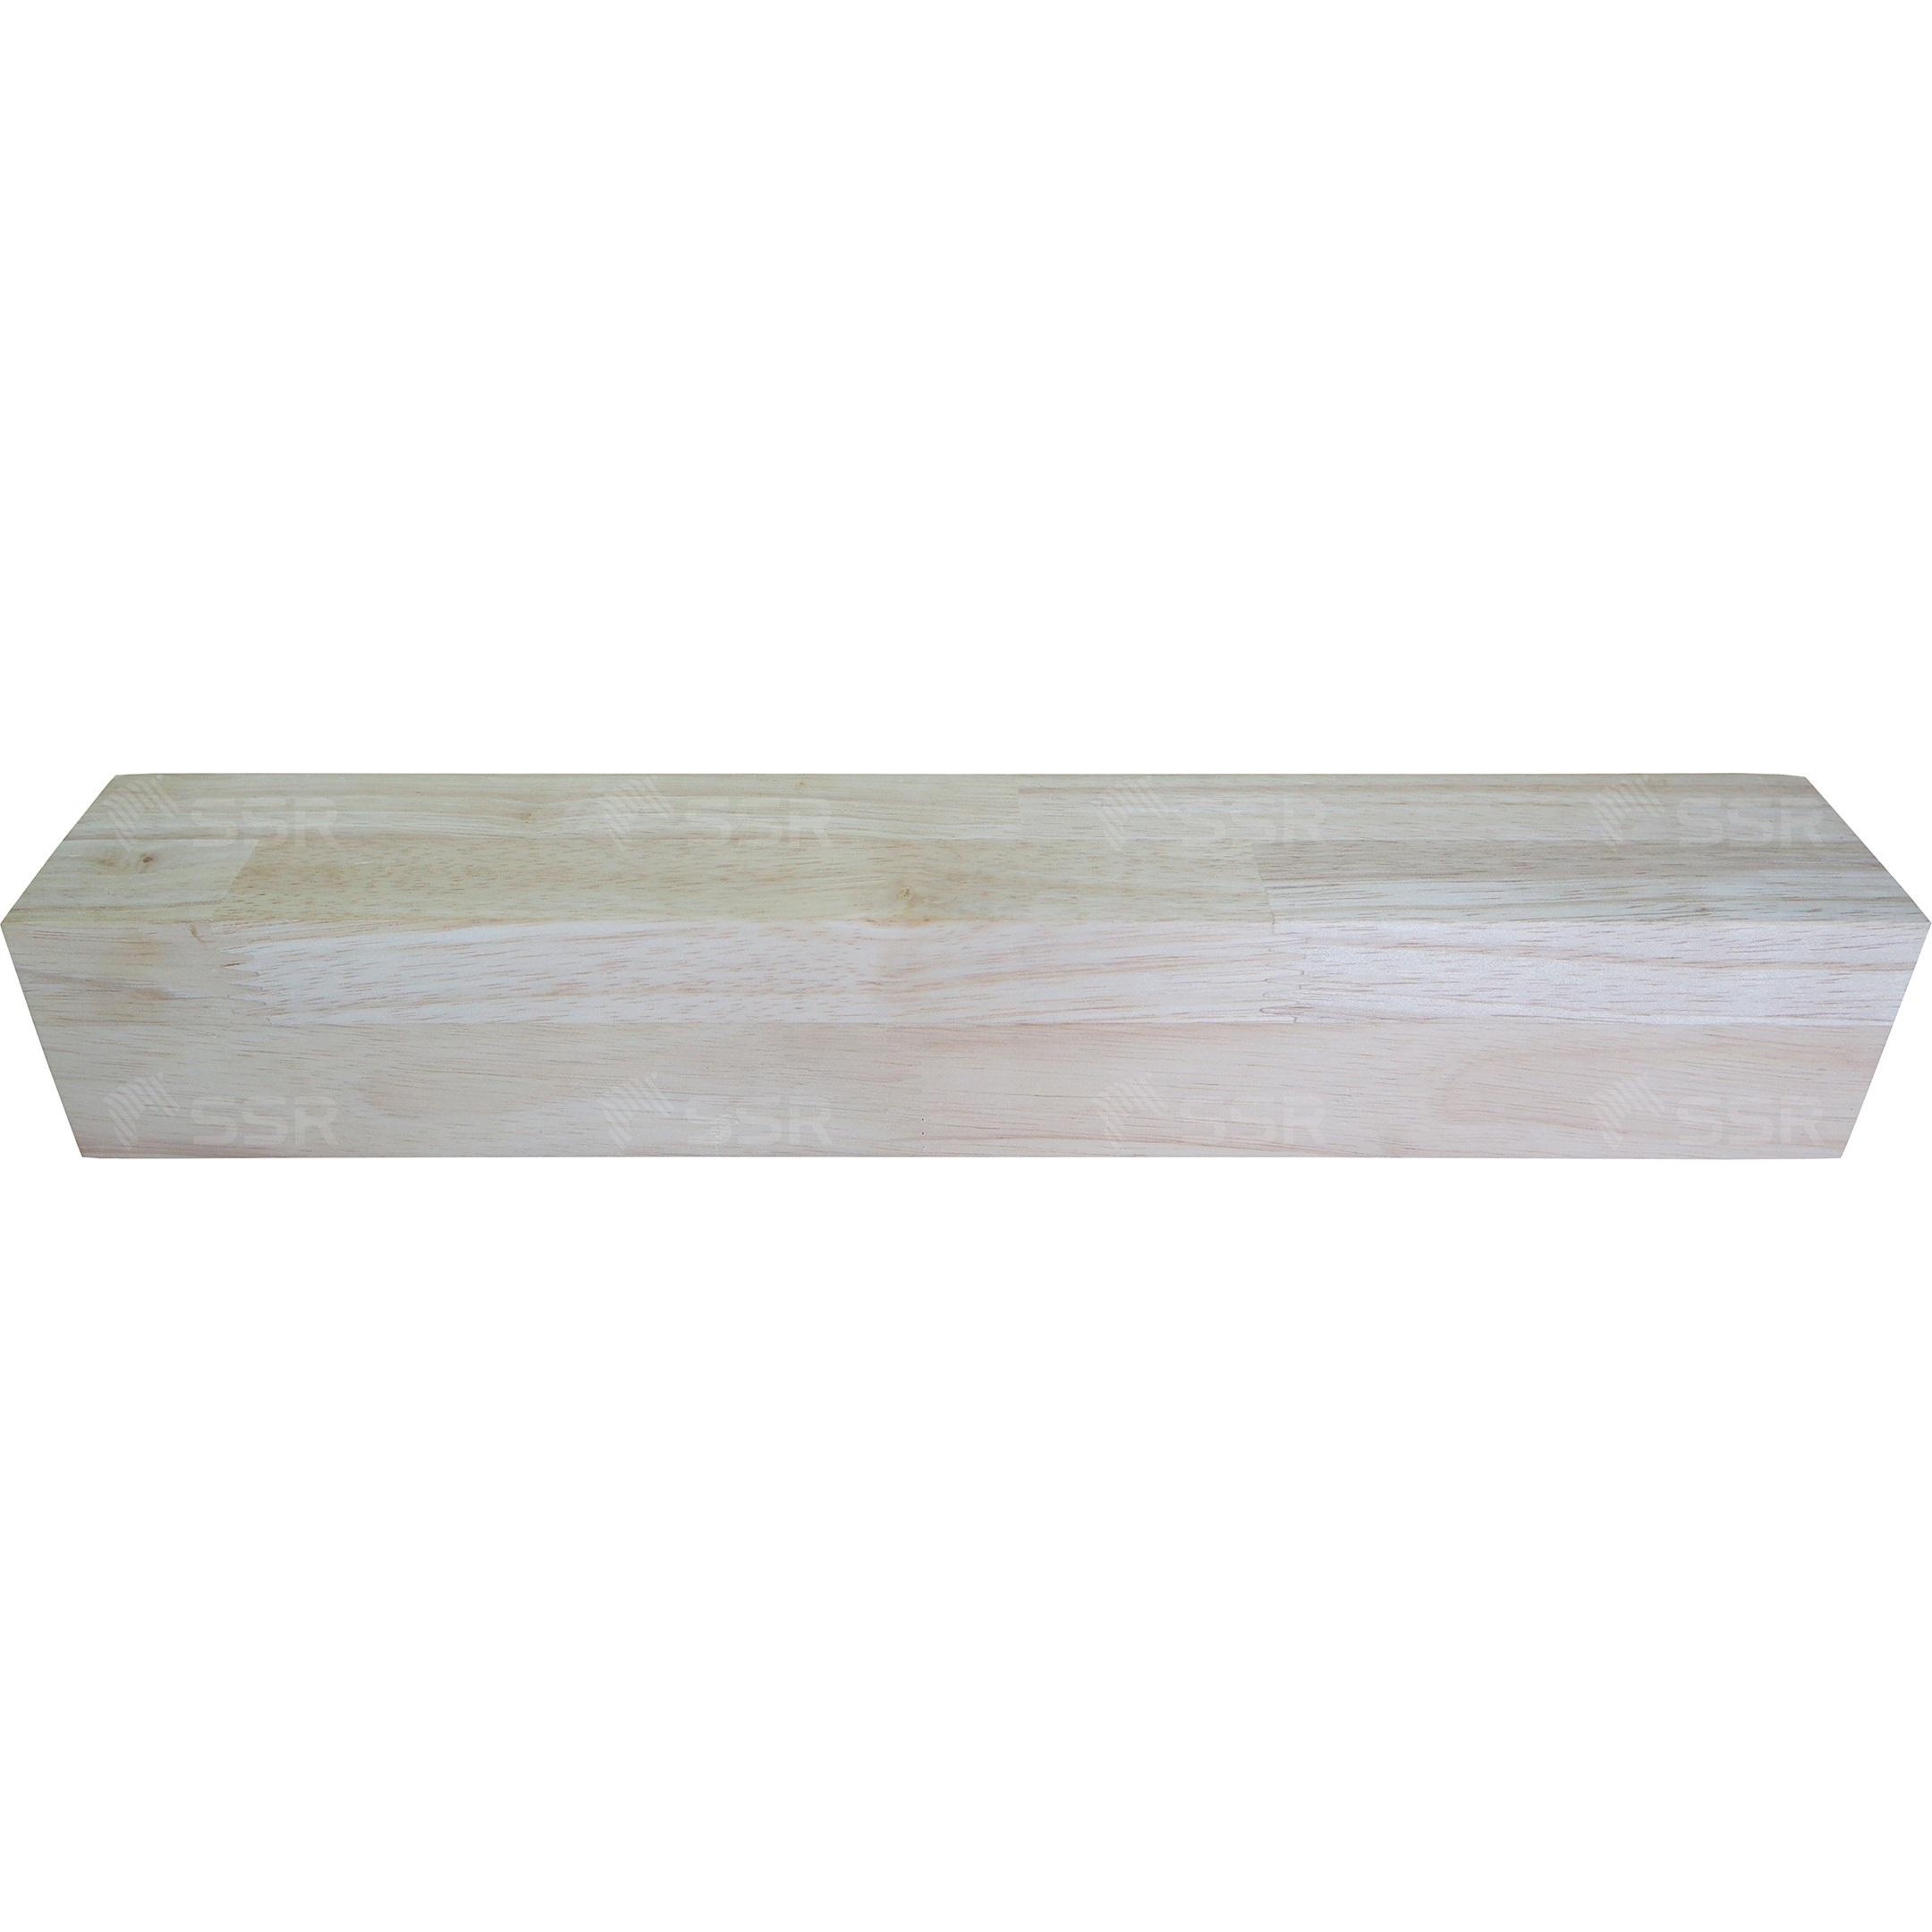 Rubberwood Wood Block Finger Joint Block Wood Industry Global Commerce Trade International Wood Product Supplier Wholesale FSC Certified International Business Import Export